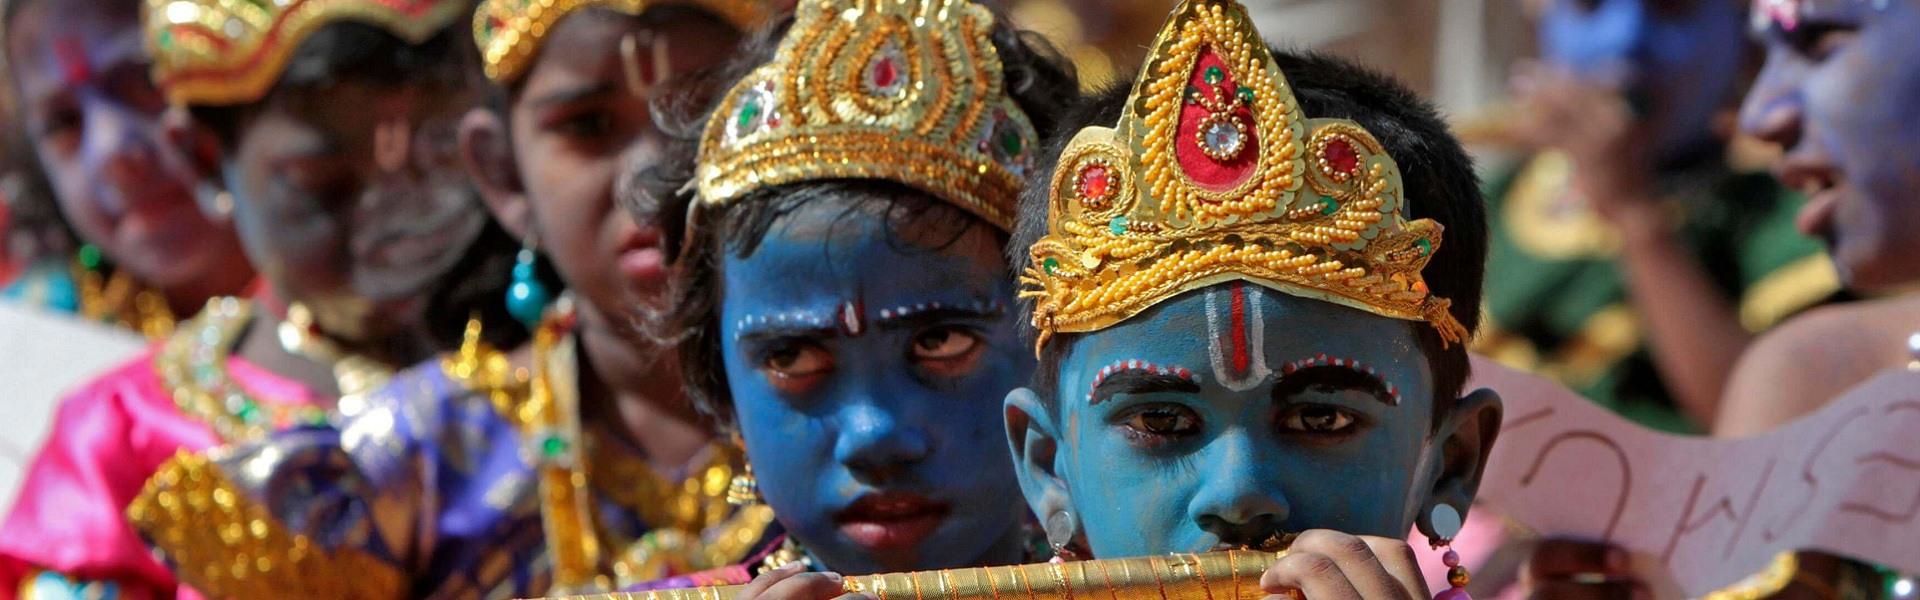 10 Delightful Festivals in August in India